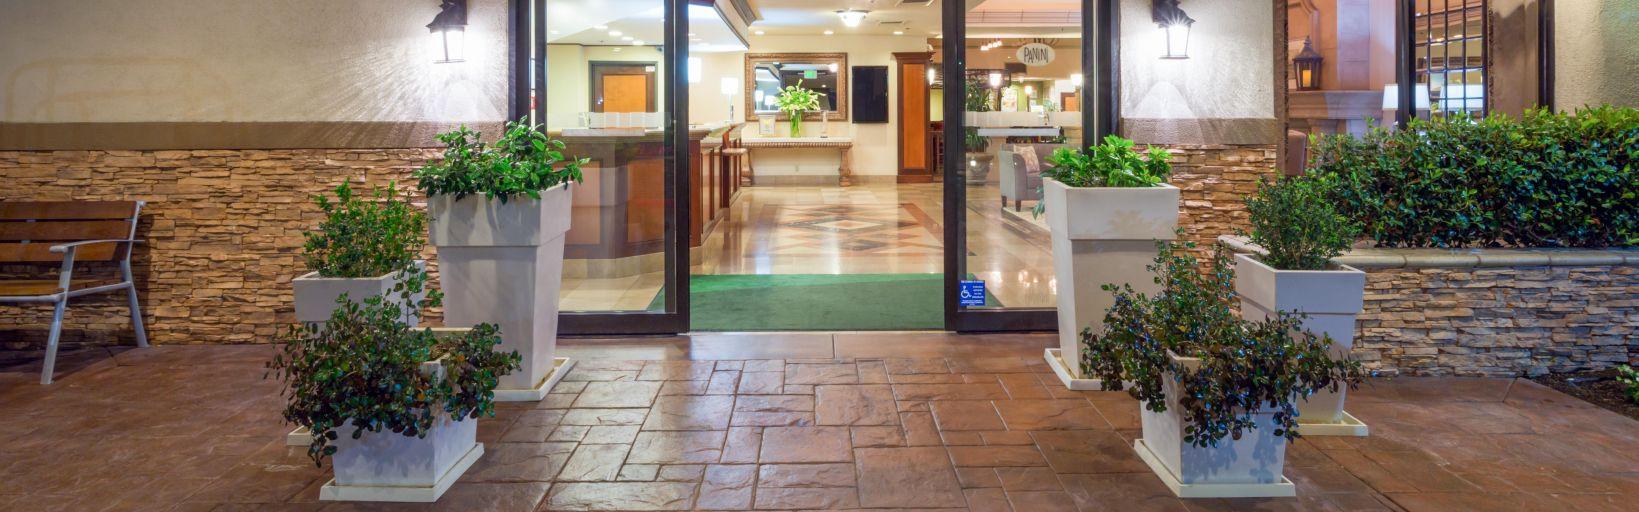 Holiday Inn Santa Ana-Orange Co. Arpt Hotel by IHG